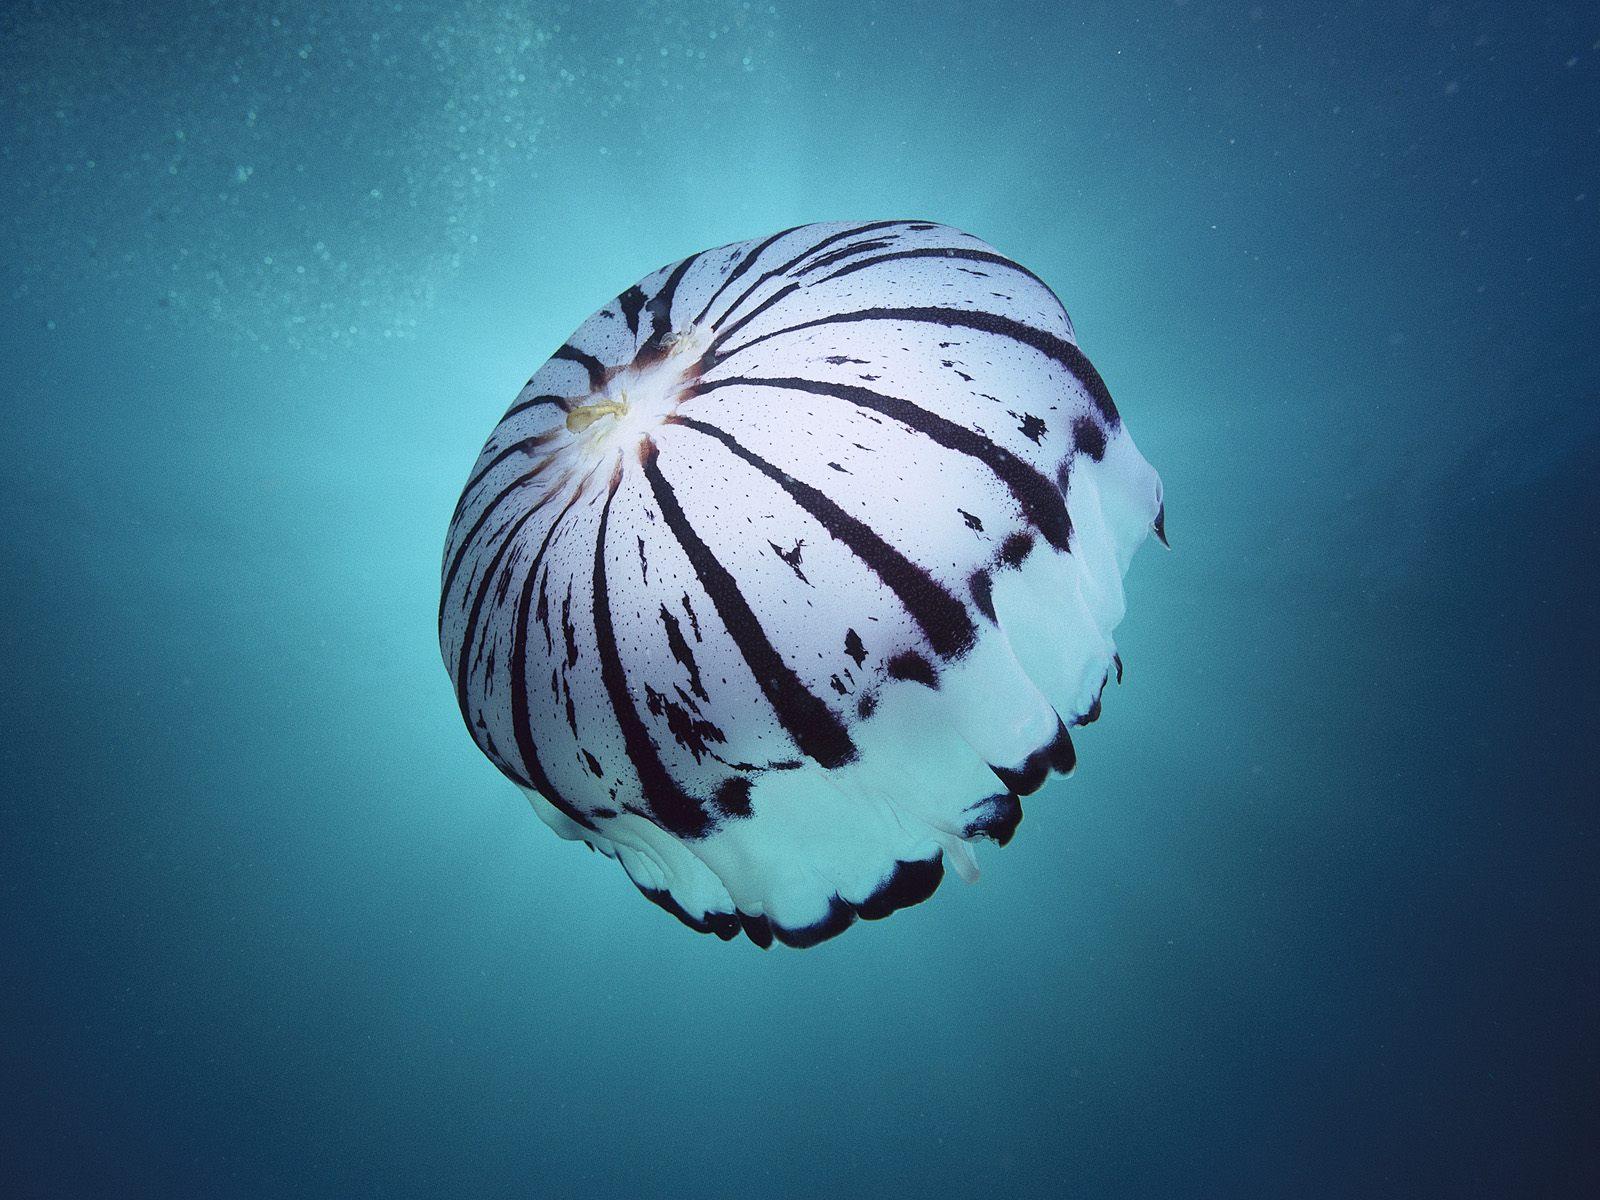 pics of jelly fish